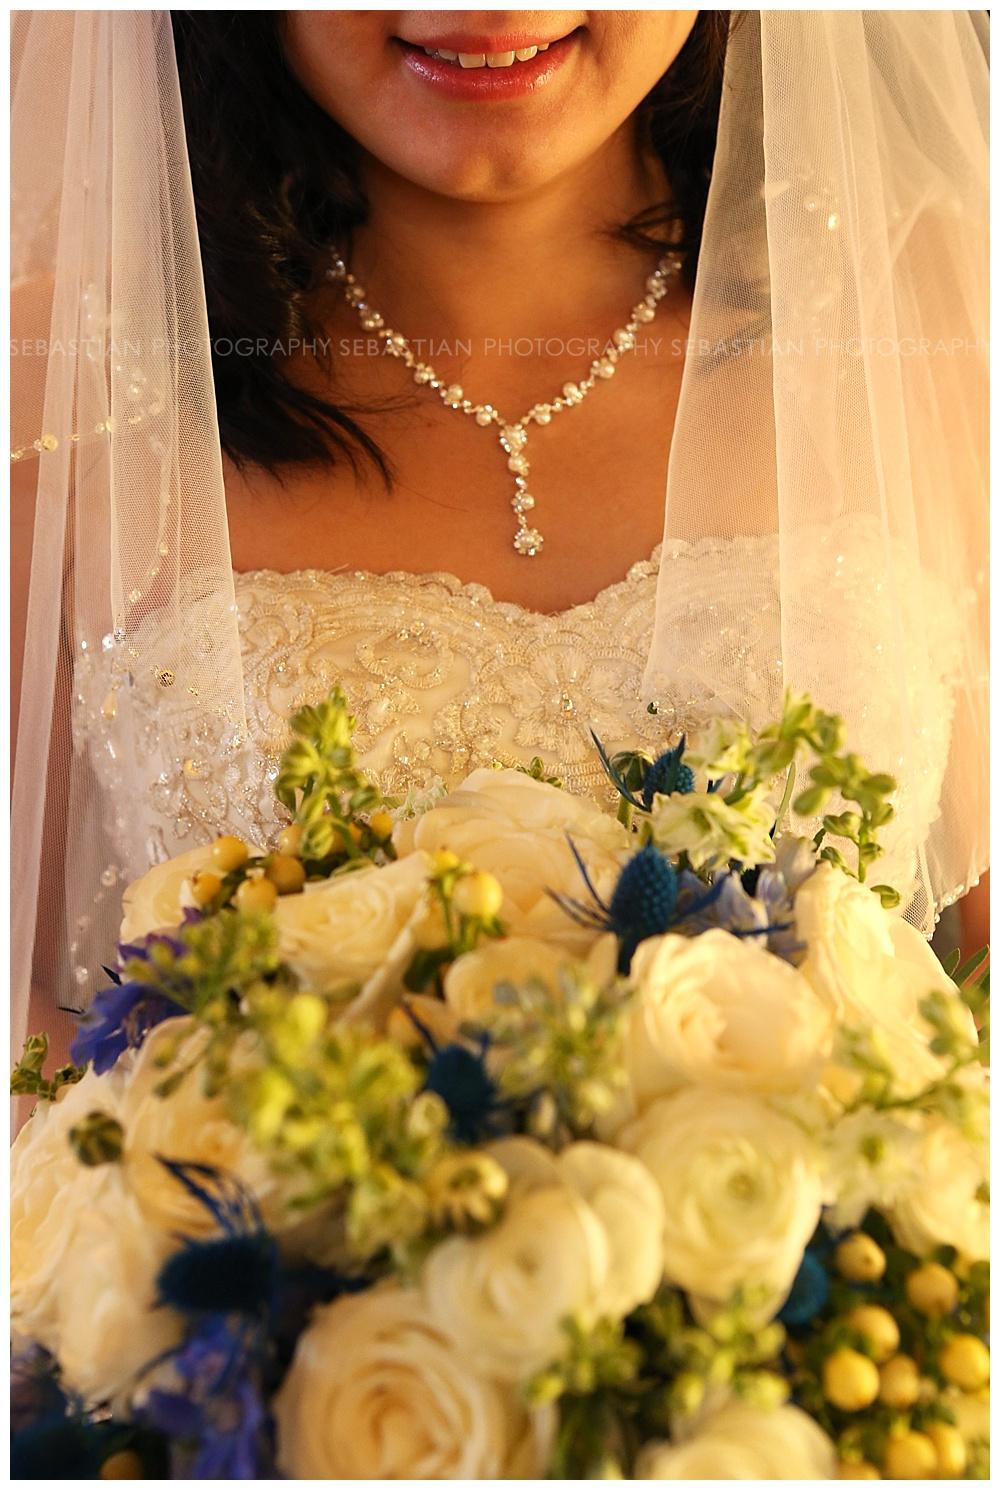 Sebastian_Photography_Wedding_StClements_CT02.jpg